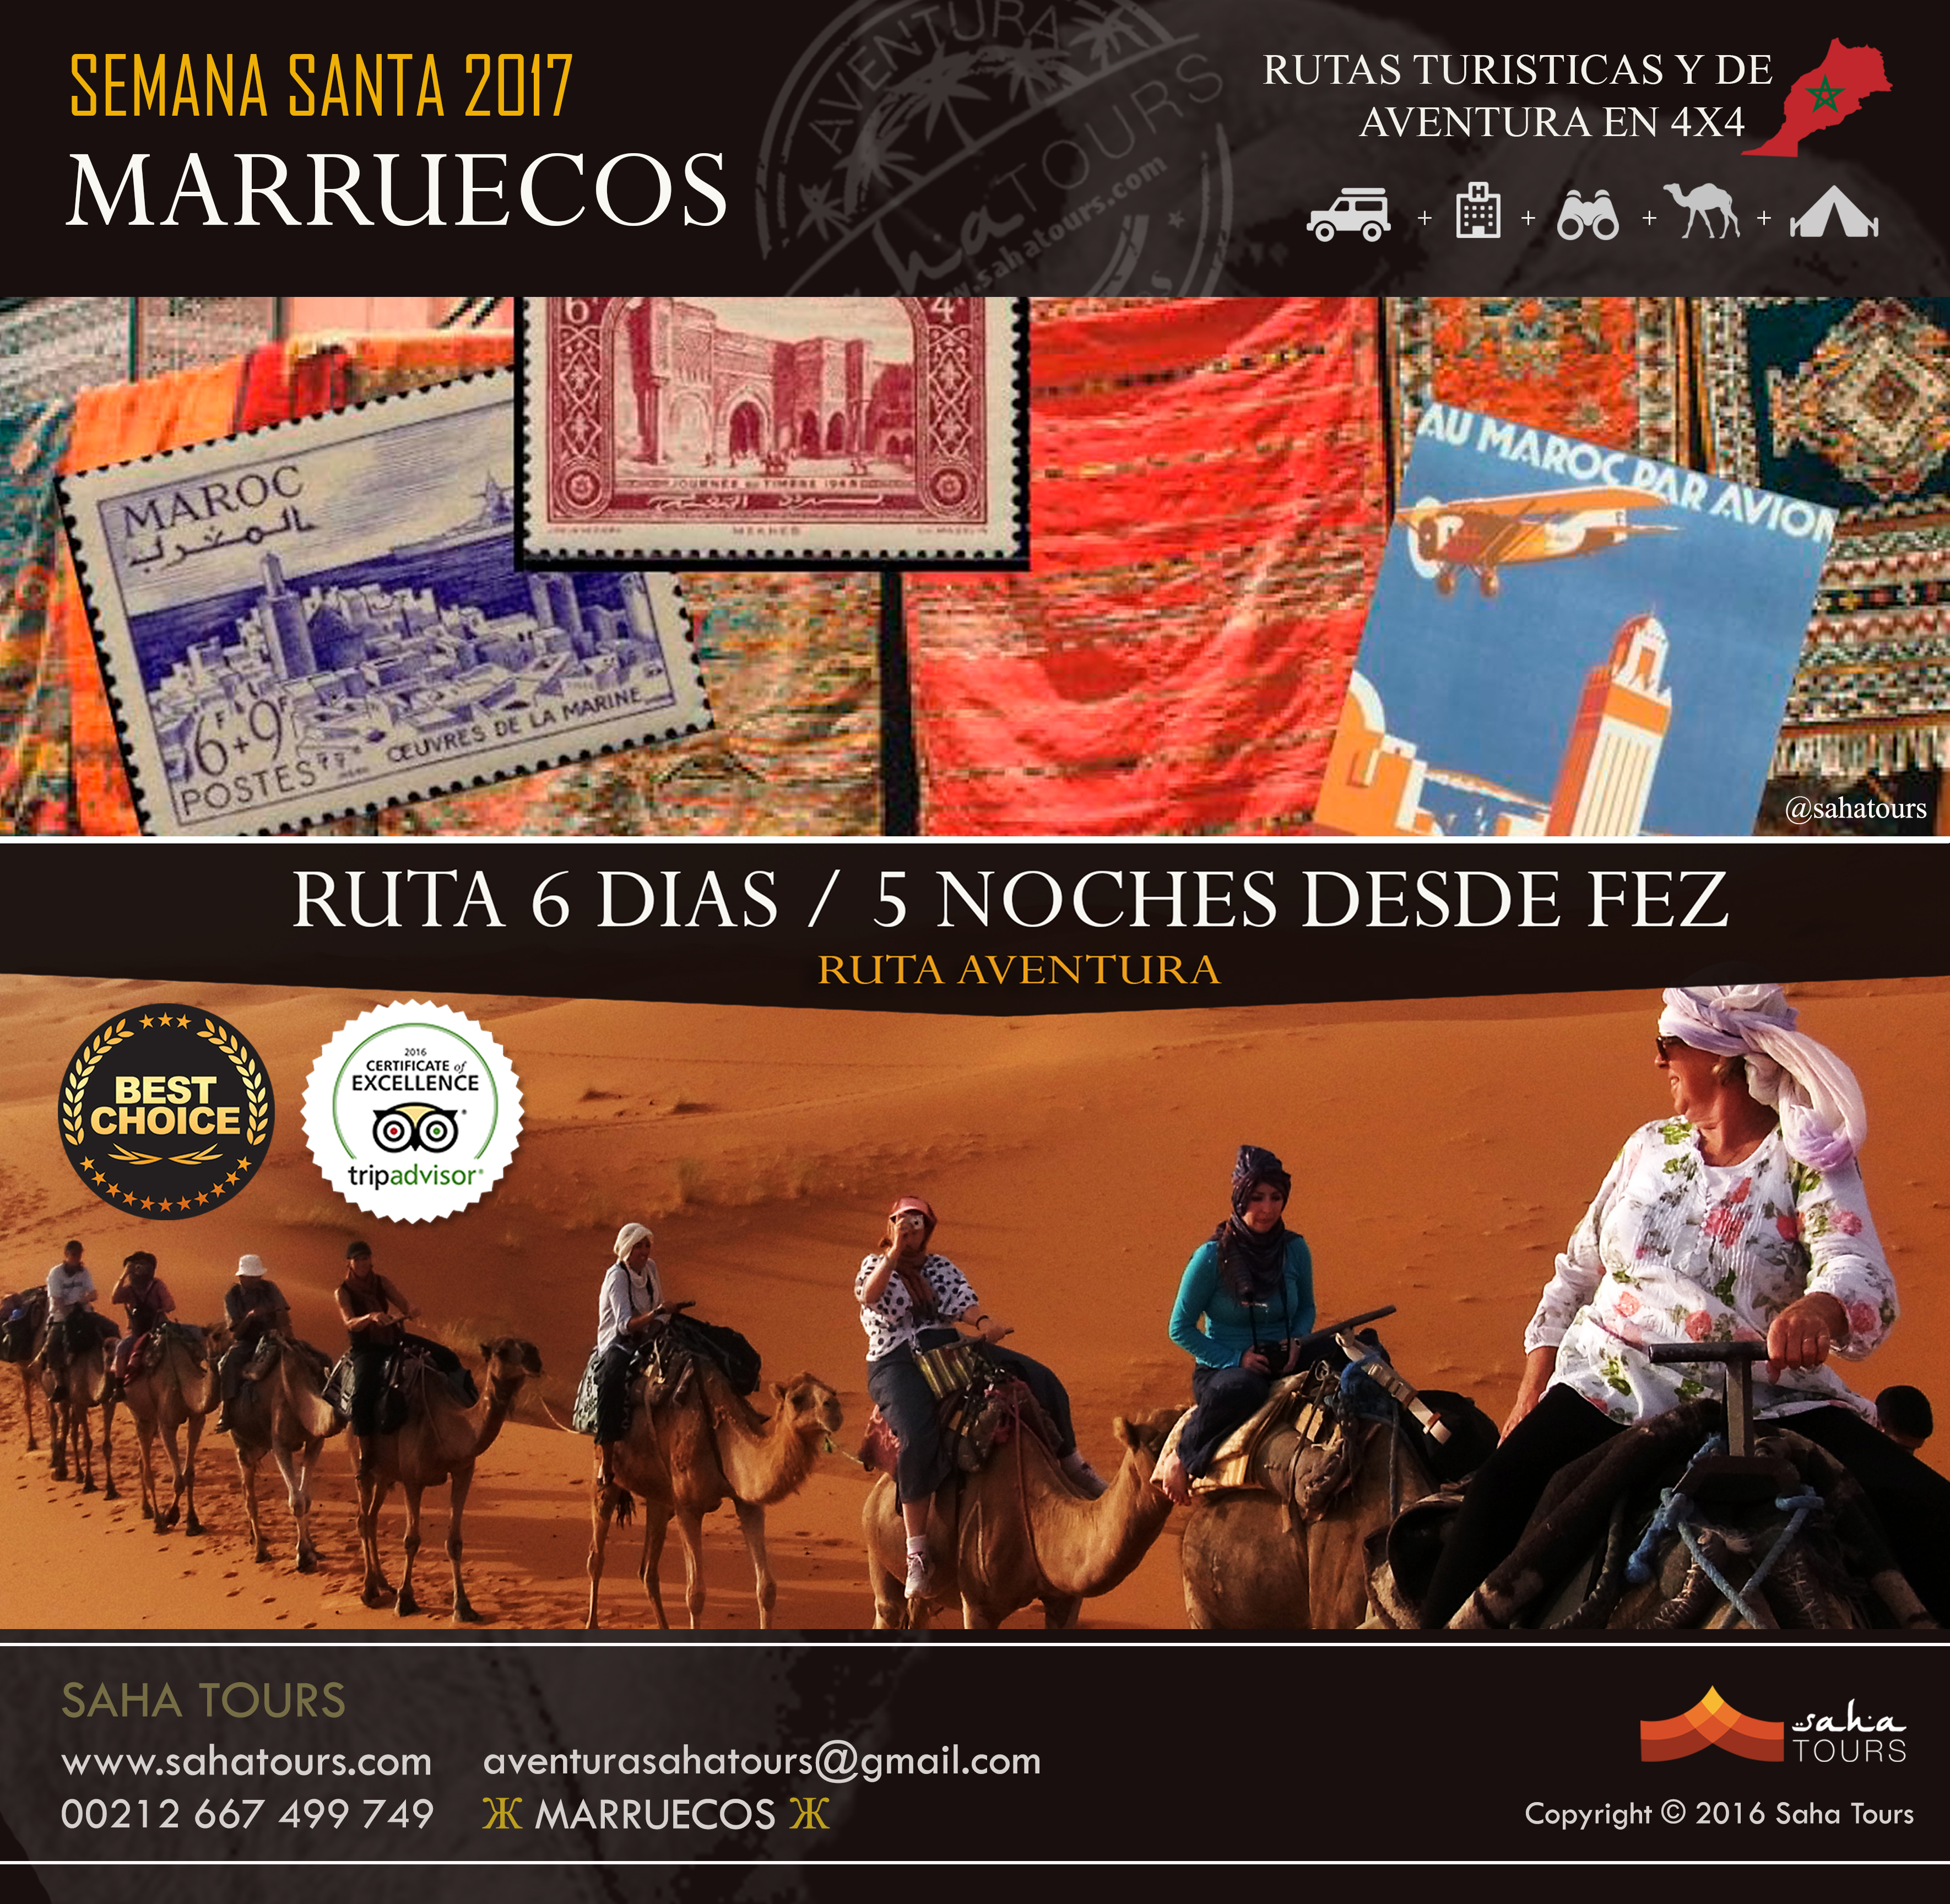 VIAJE A MARRUECOS - SEMANA SANTA 2017 - RUTA 6 DIAS / 5 NOCHES DESDE FEZ 1